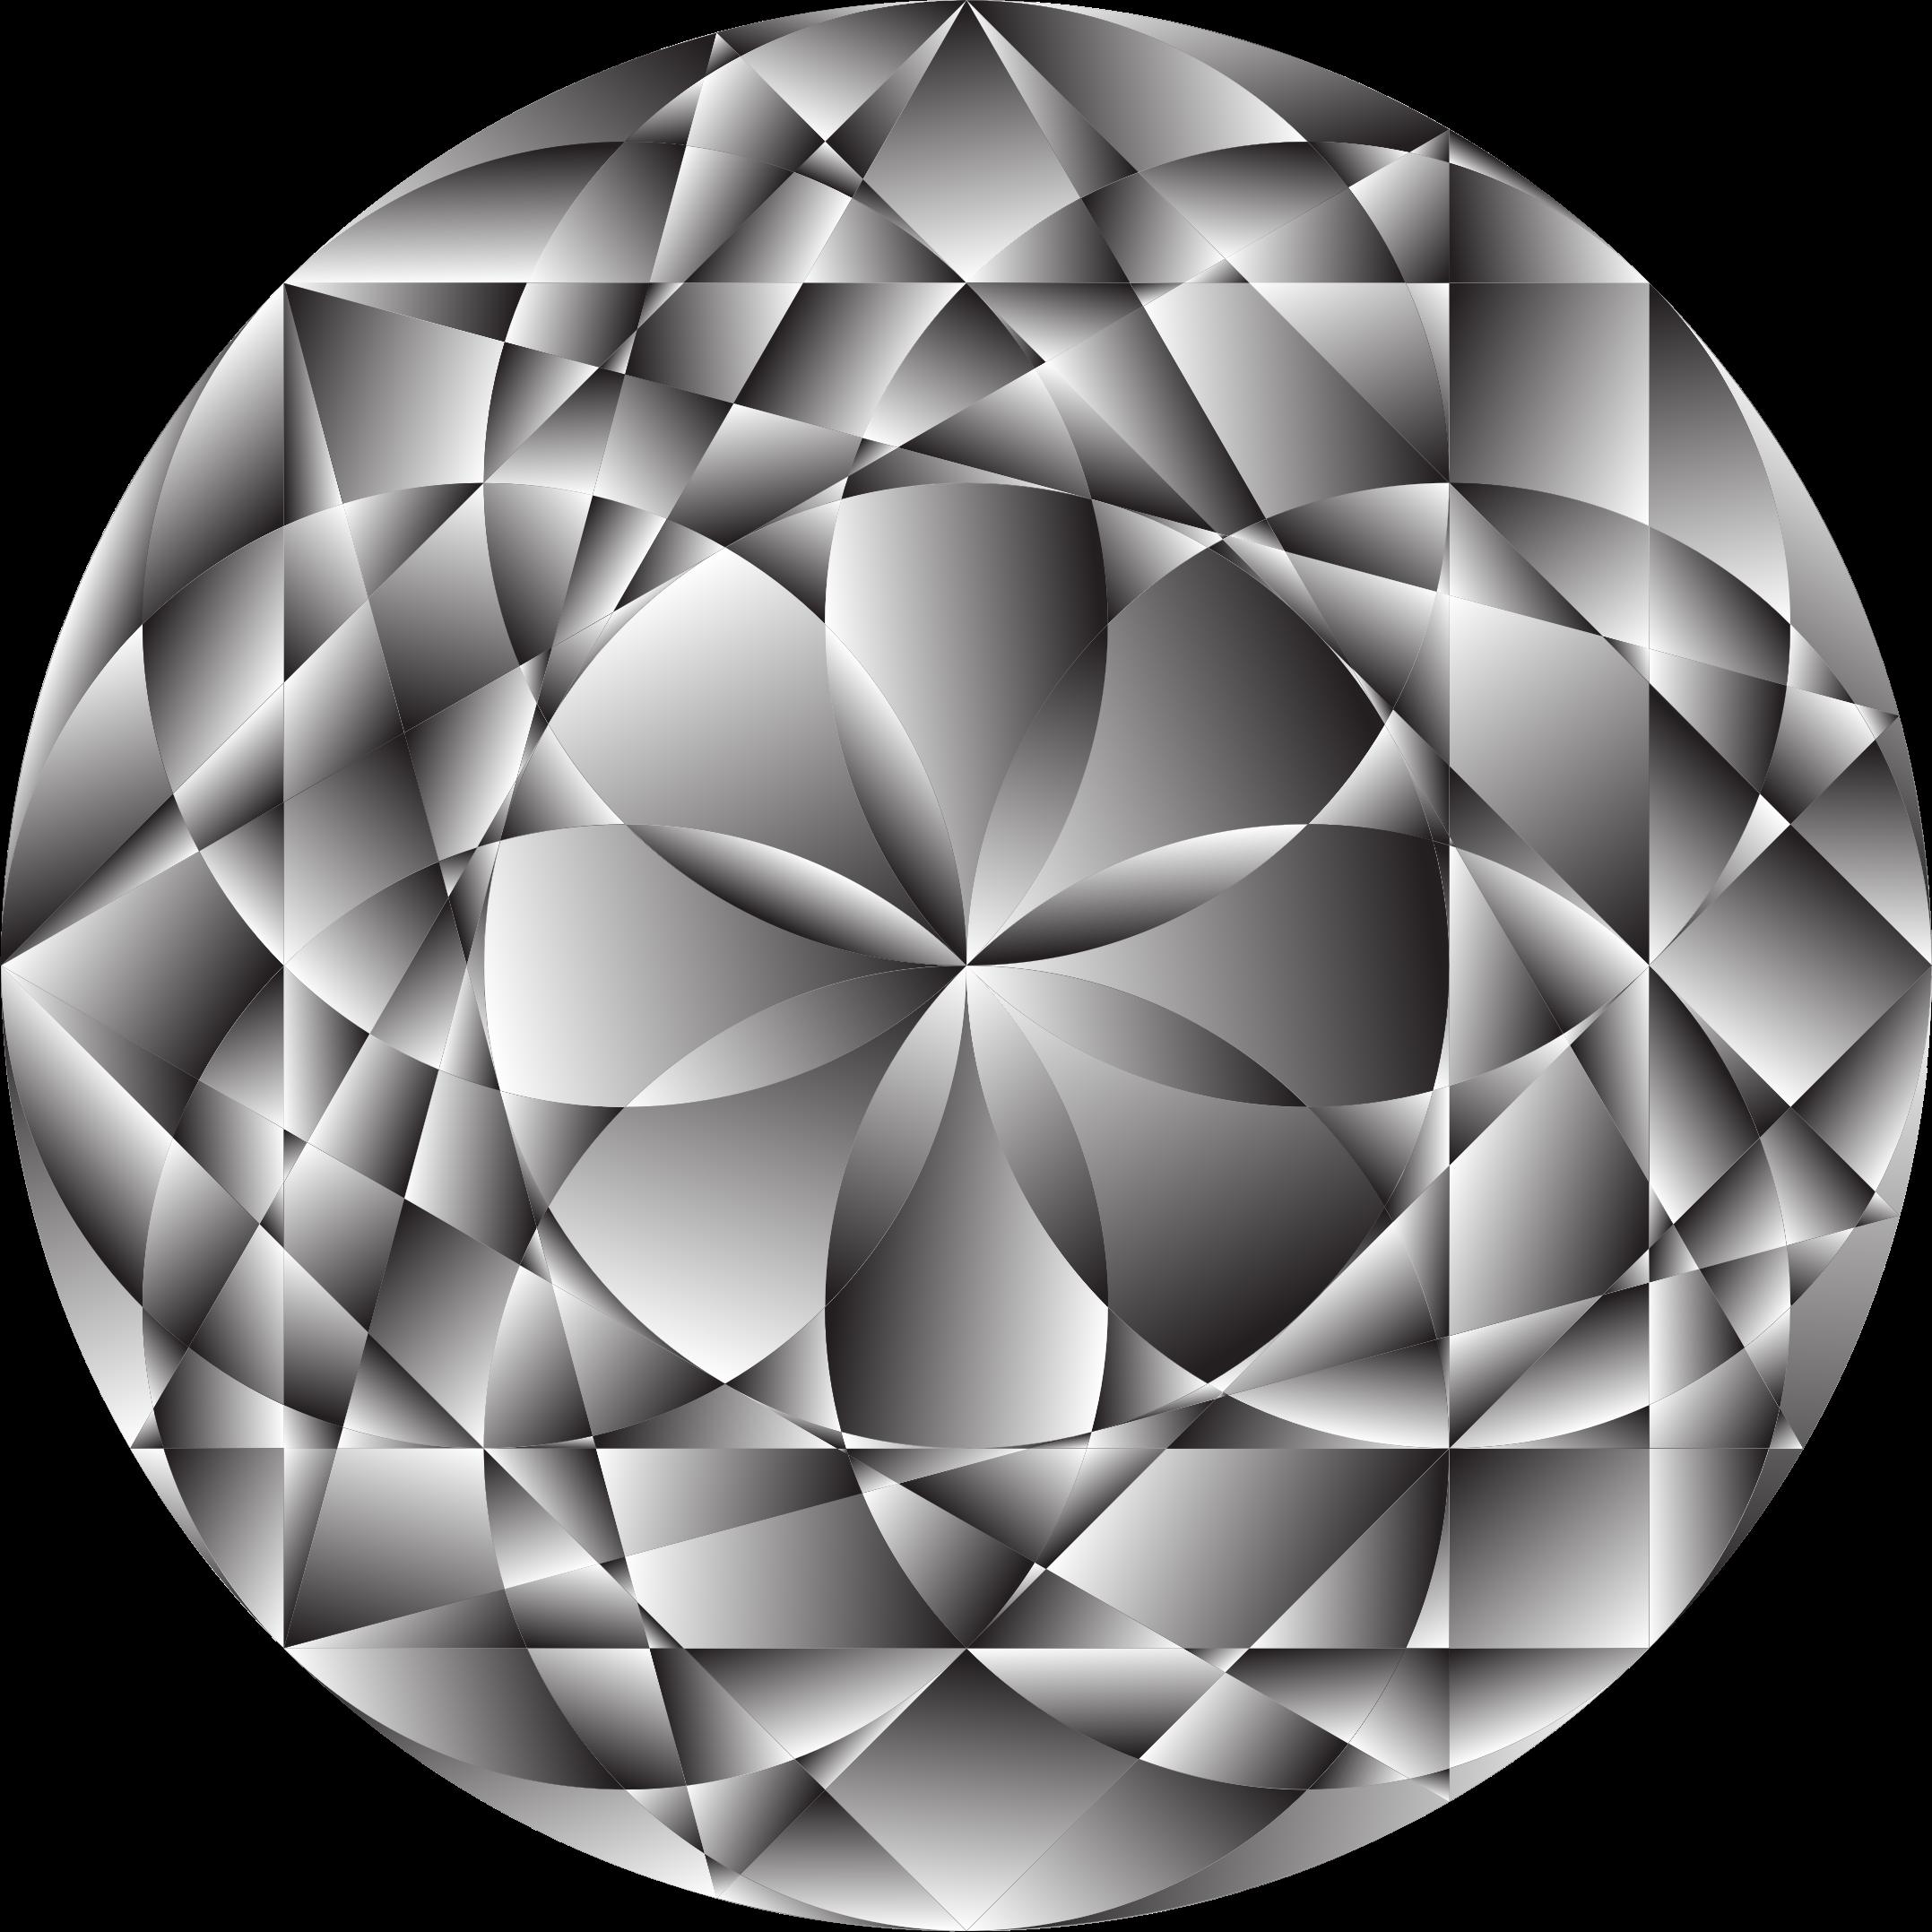 Diamond clipart circle. Gem big image png